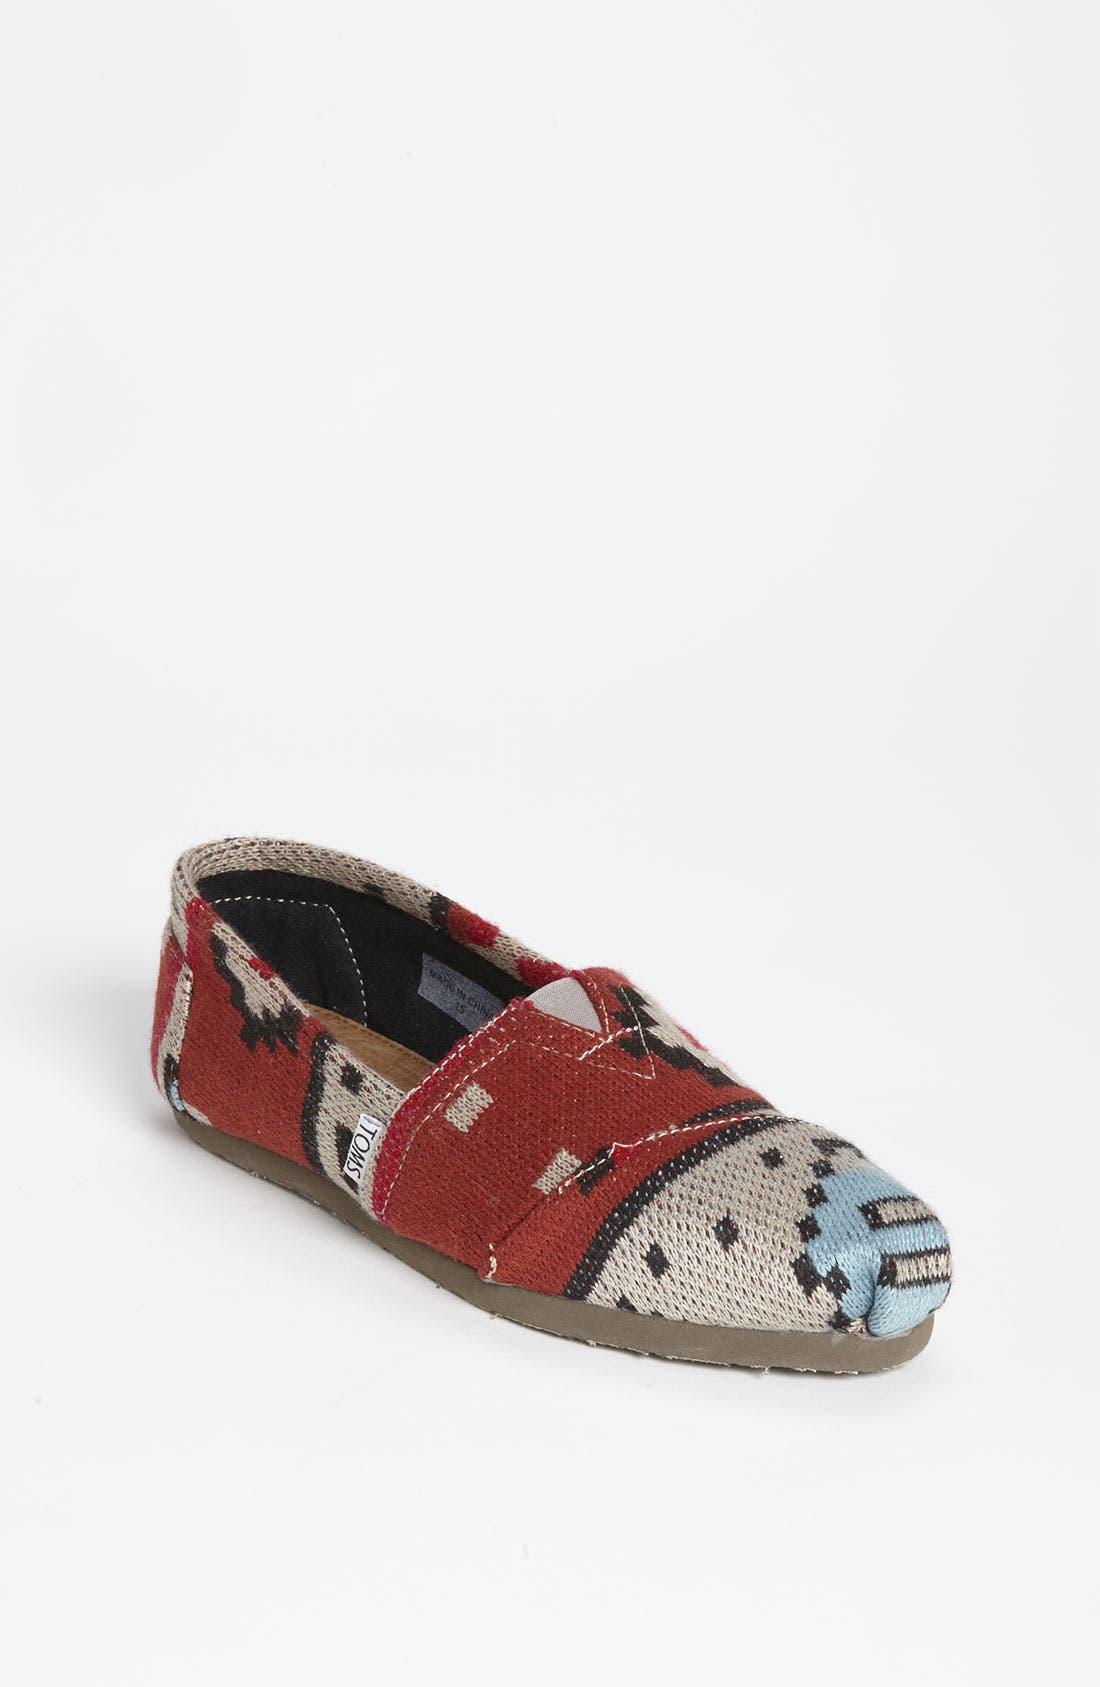 Main Image - TOMS 'Classic - Tribal' Knit Slip-On (Women)